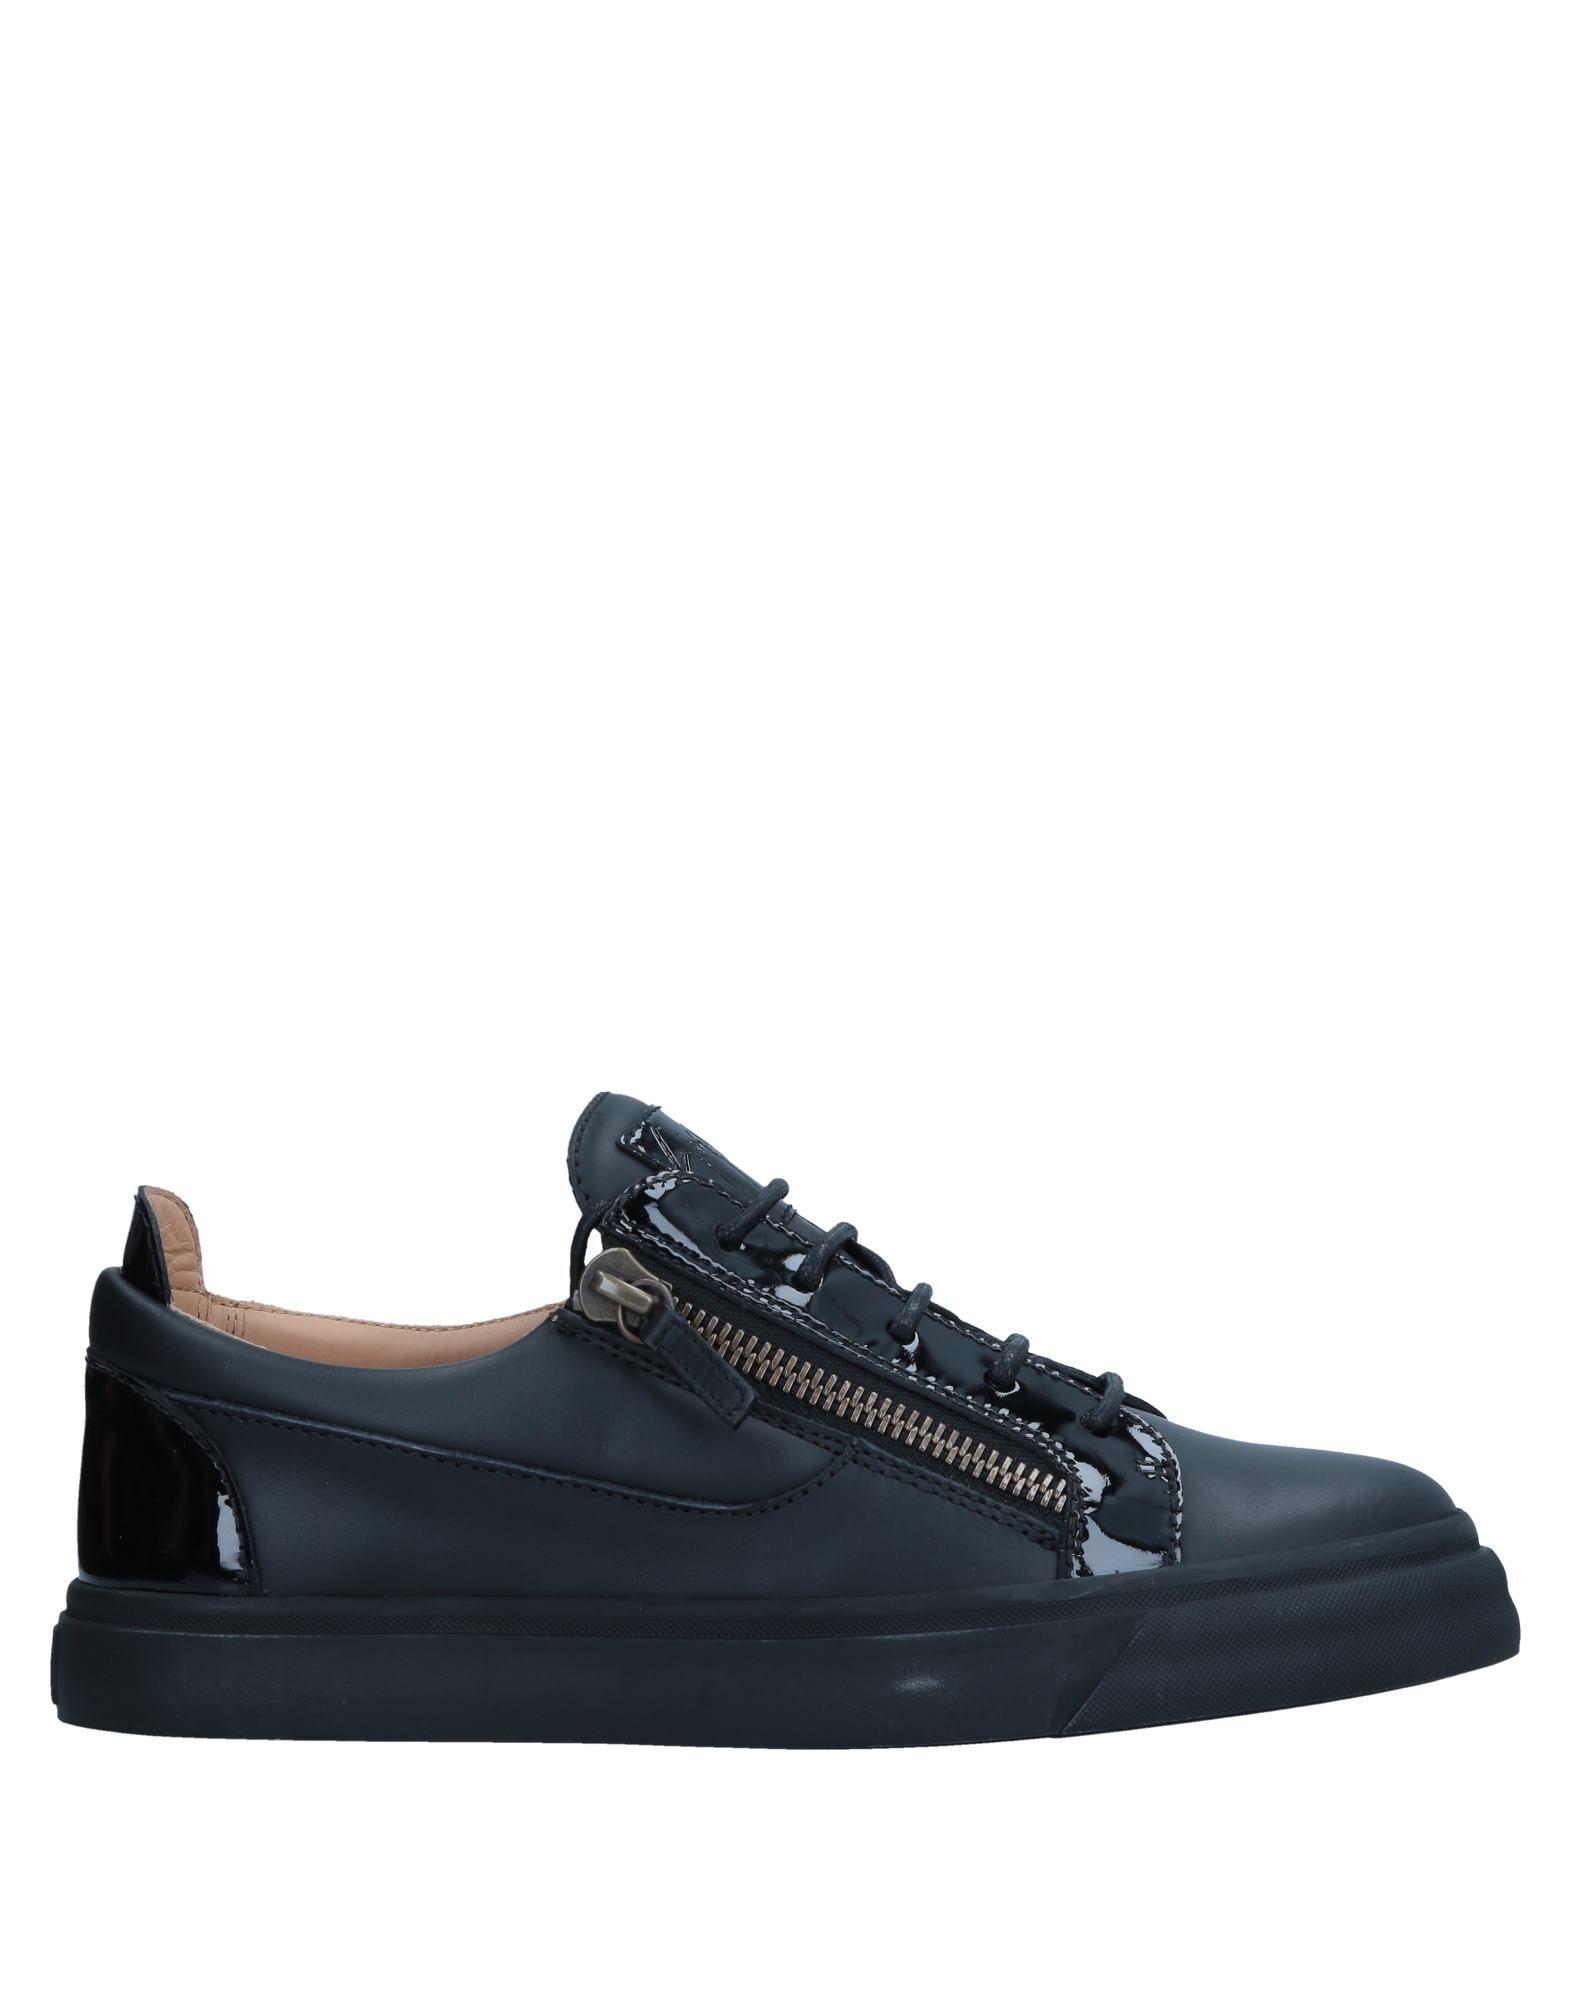 Giuseppe Zanotti Sneakers Herren  11545461FI Gute Qualität beliebte Schuhe